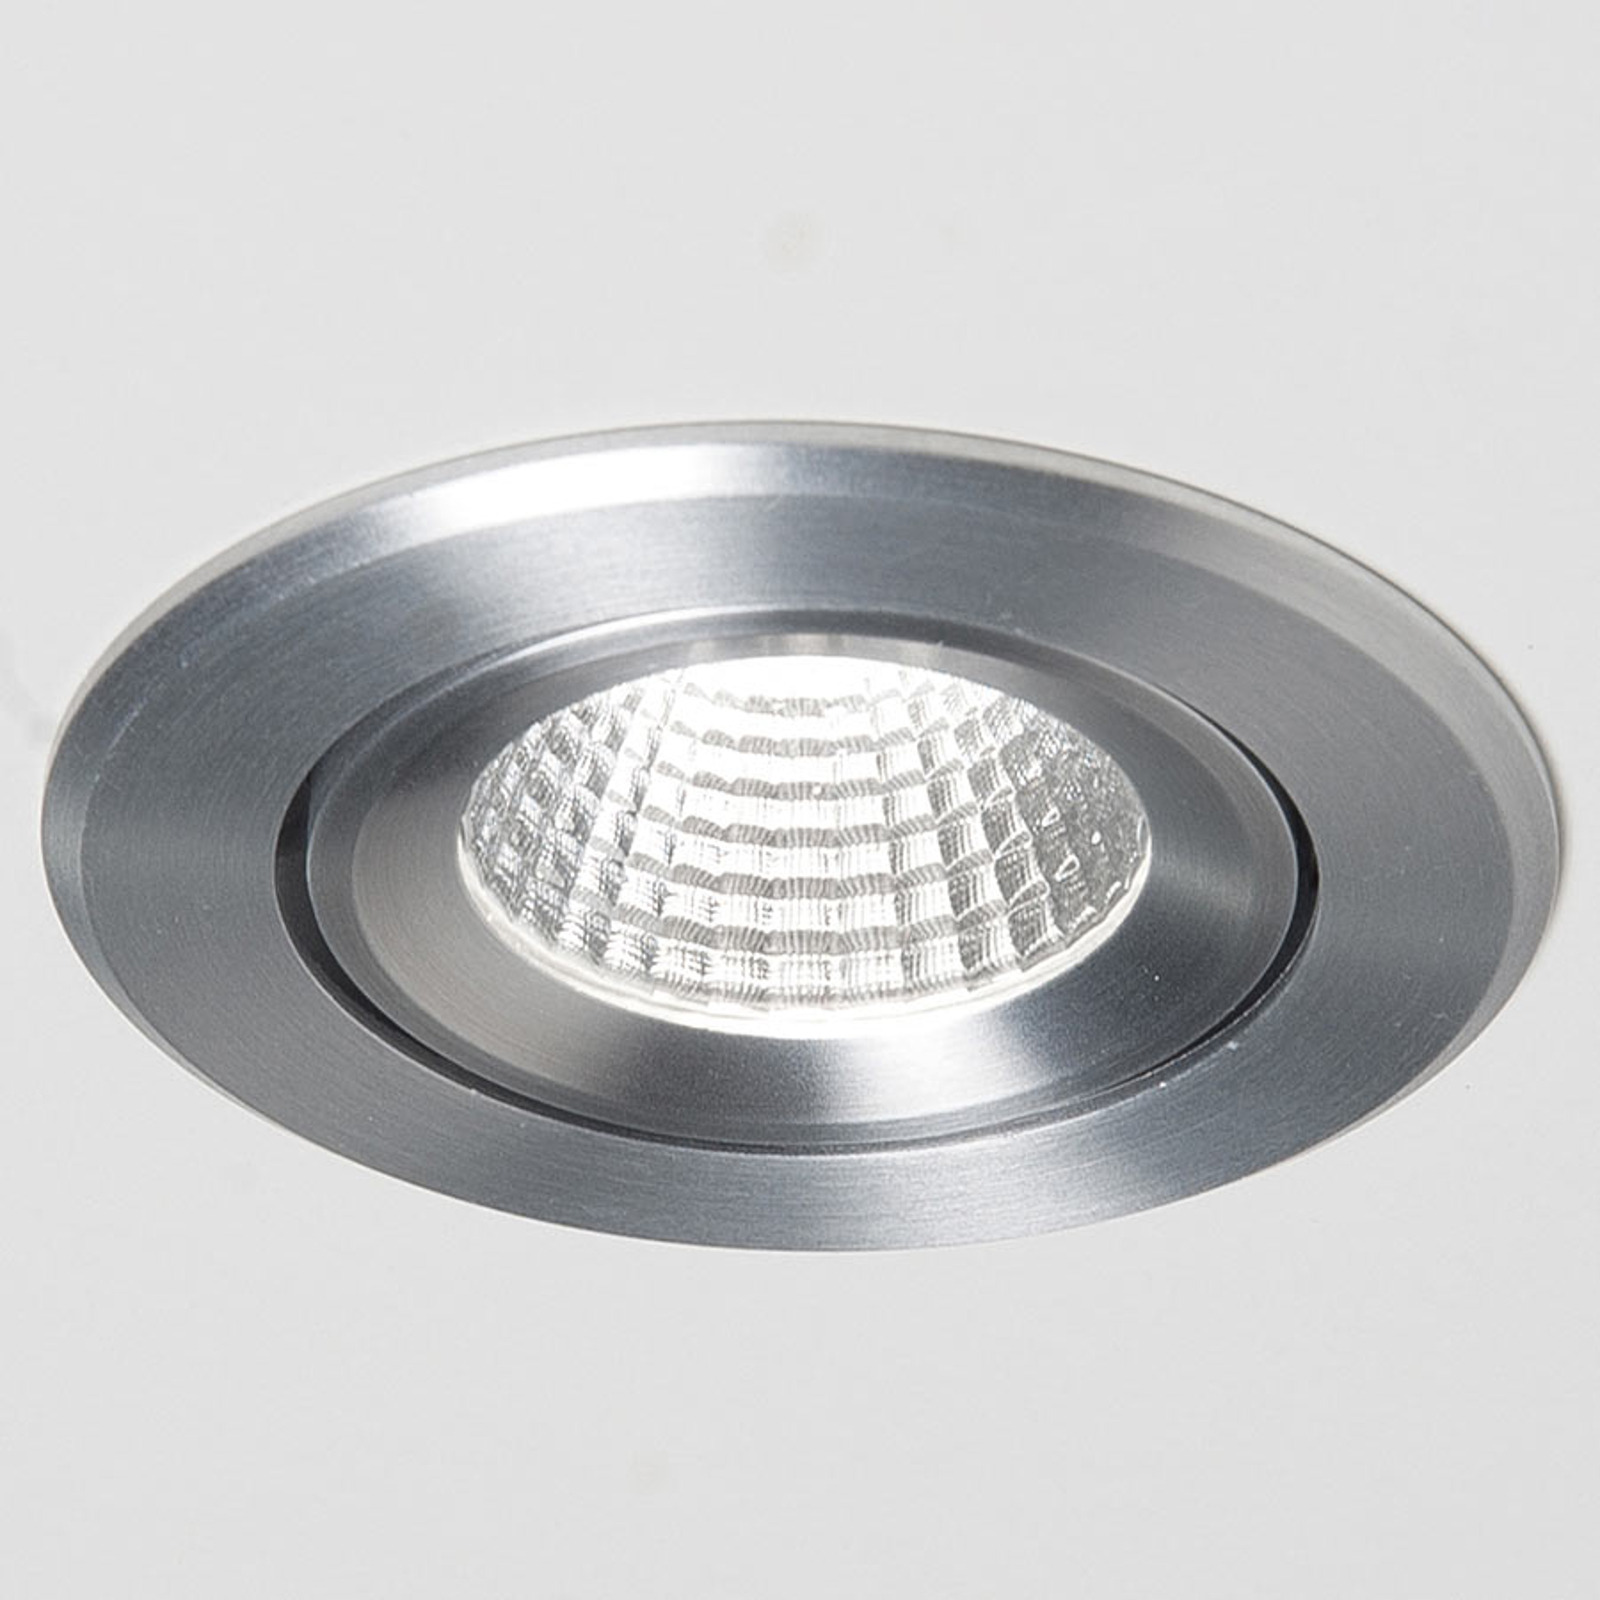 Agon Round LED inbouwspot 3000K 40° alu geborsteld